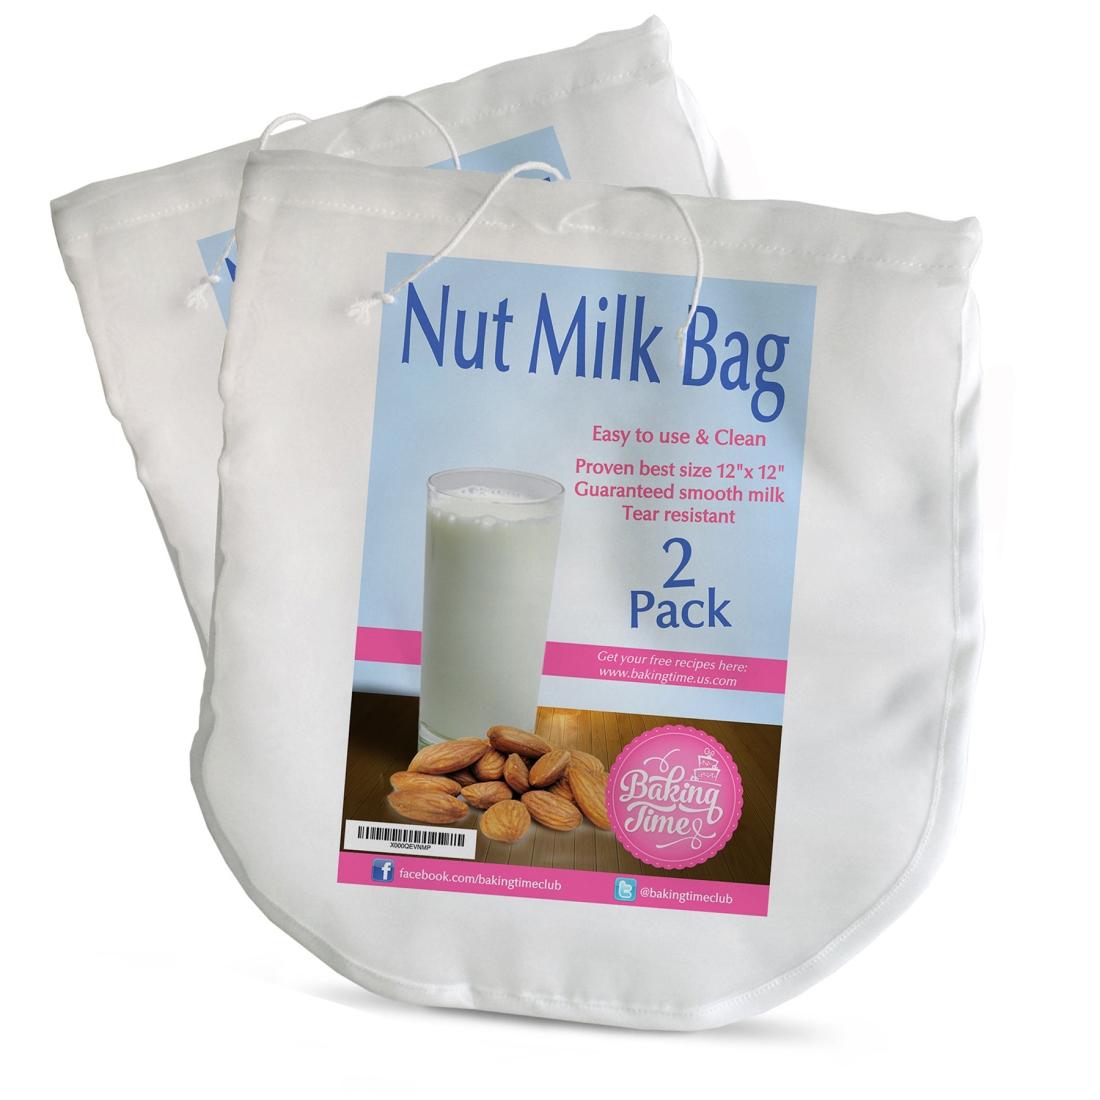 Nut milk bag 2 pack